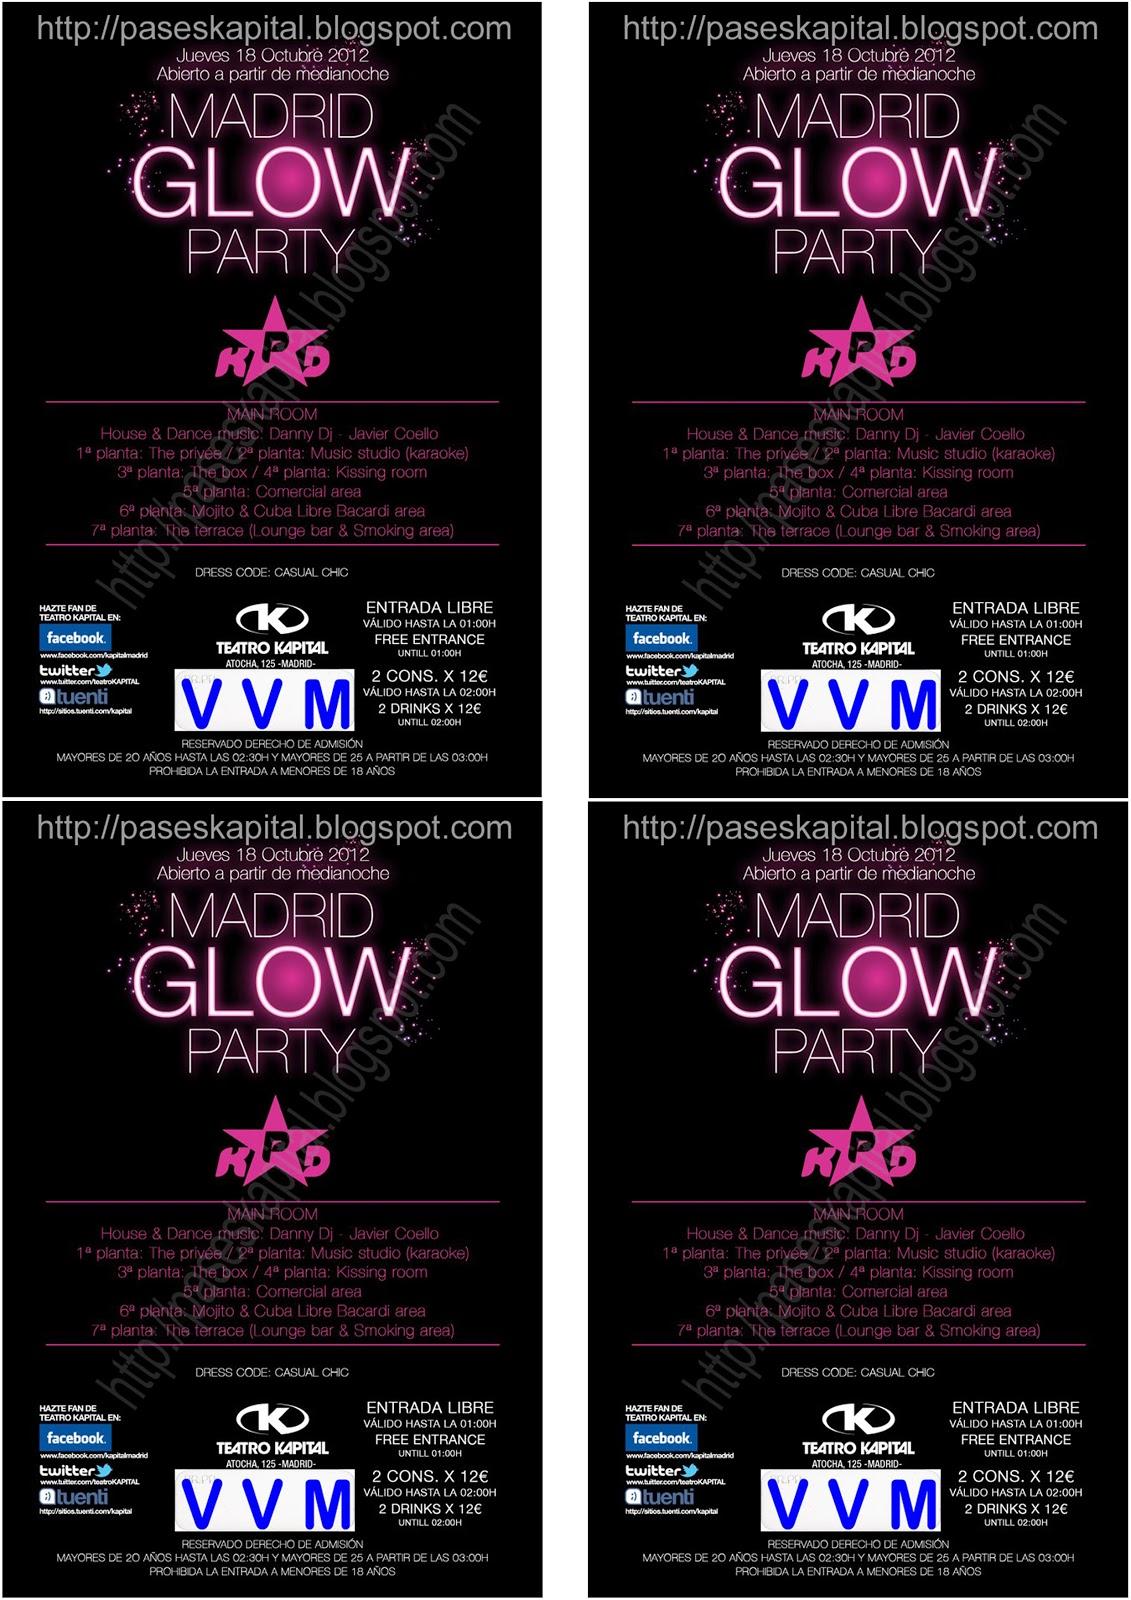 Flyers kapital jueves 18 de octubre madrid glow party for Kapital jueves gratis